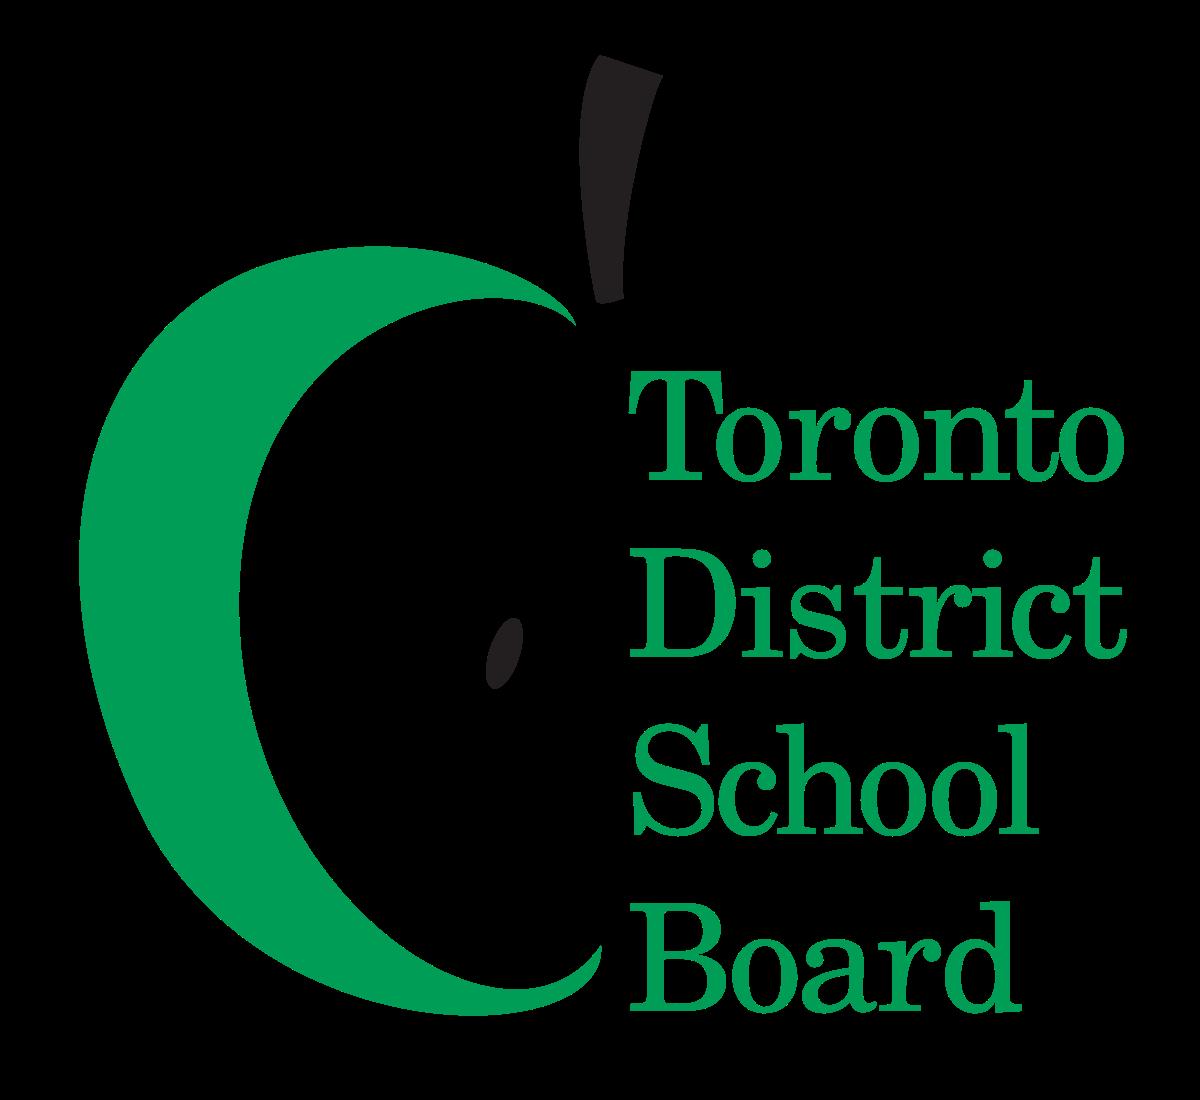 Sở Giáo Dục Học Khu Toronto District School Board - Toronto, Ontario, Canada